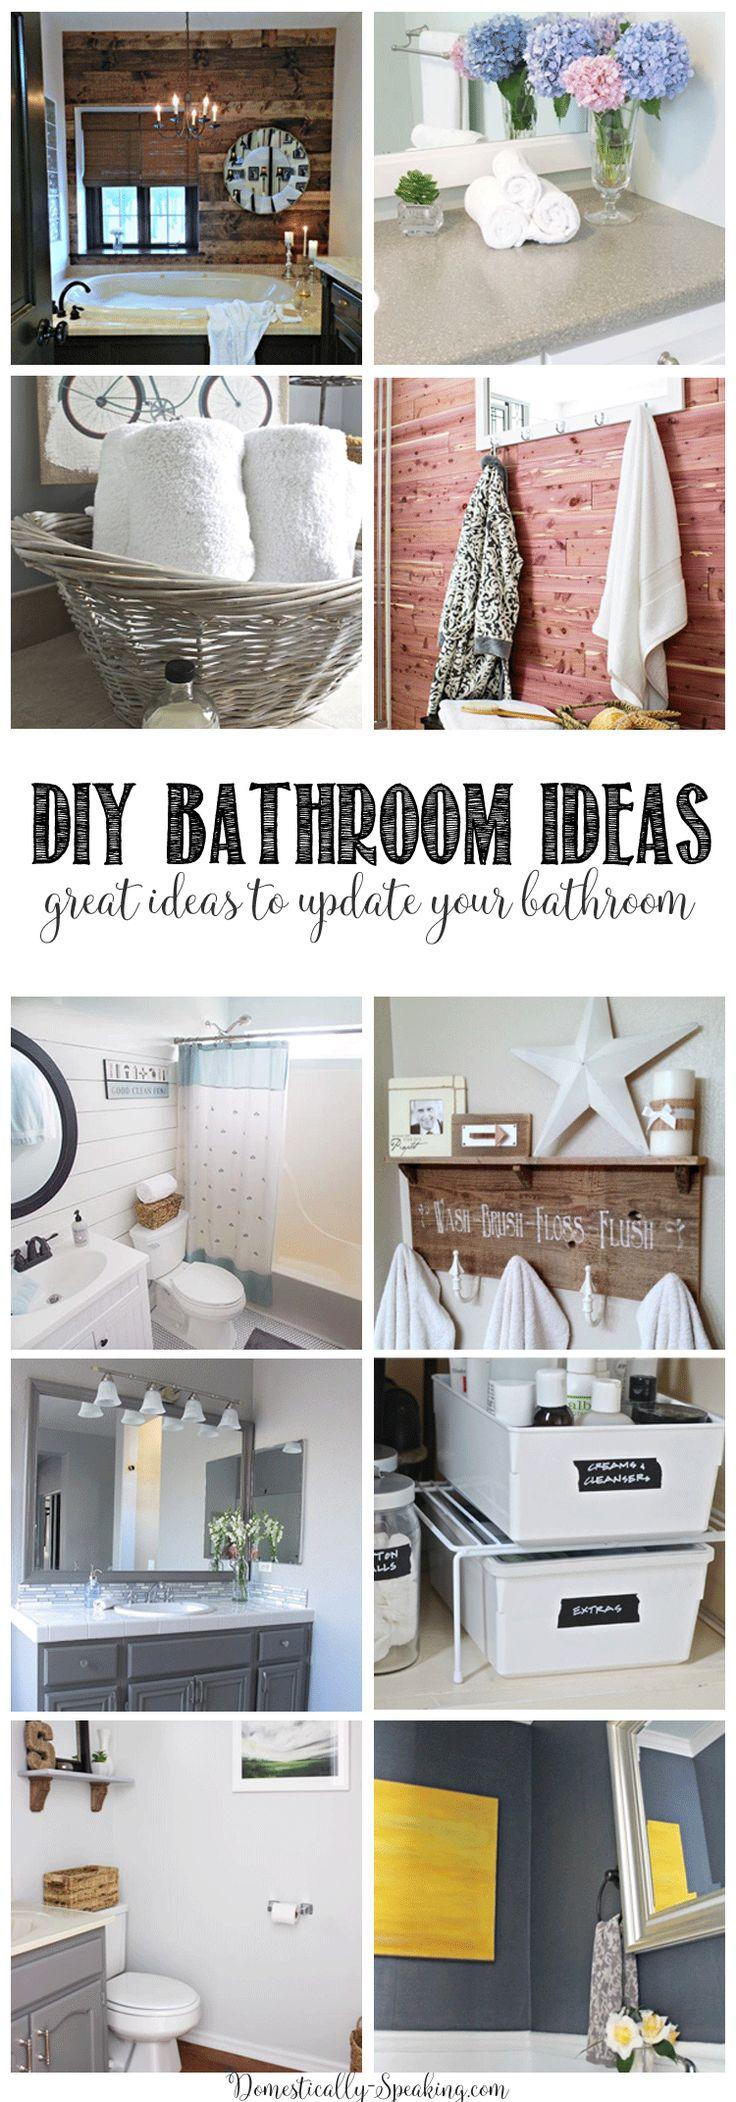 125 best diy bathroom ideas images on pinterest diy bathroom